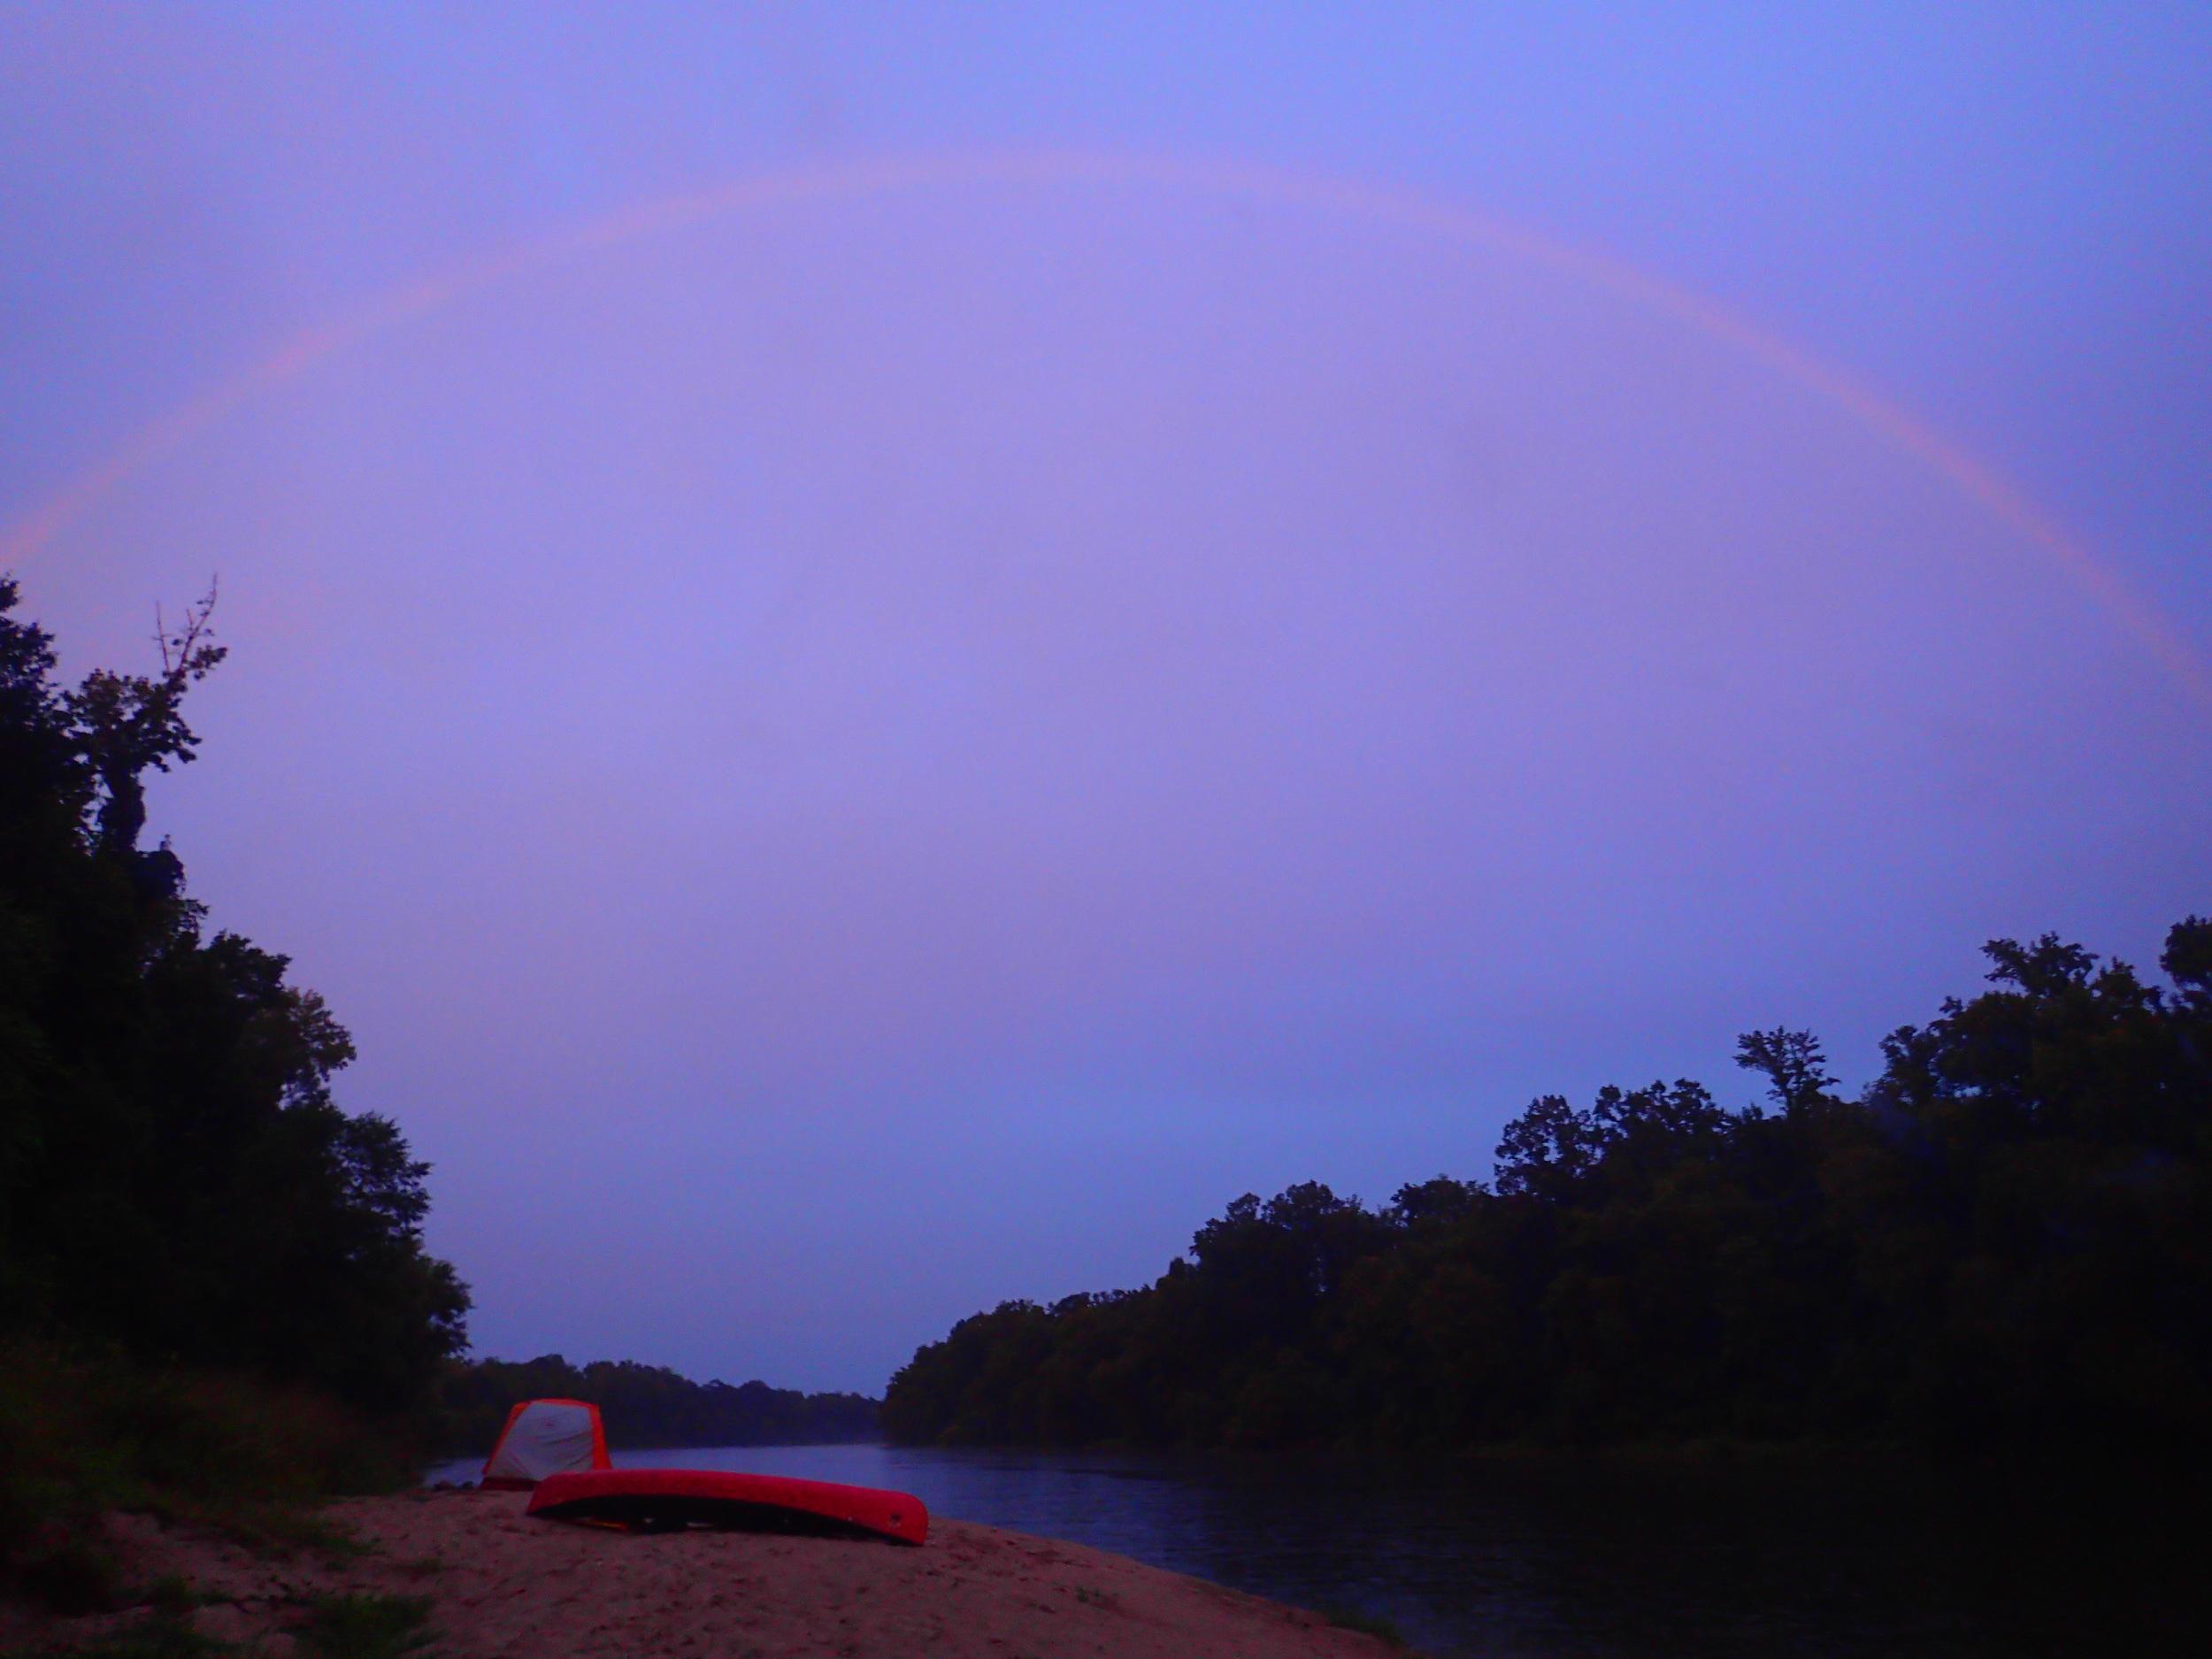 sabine river rainbow